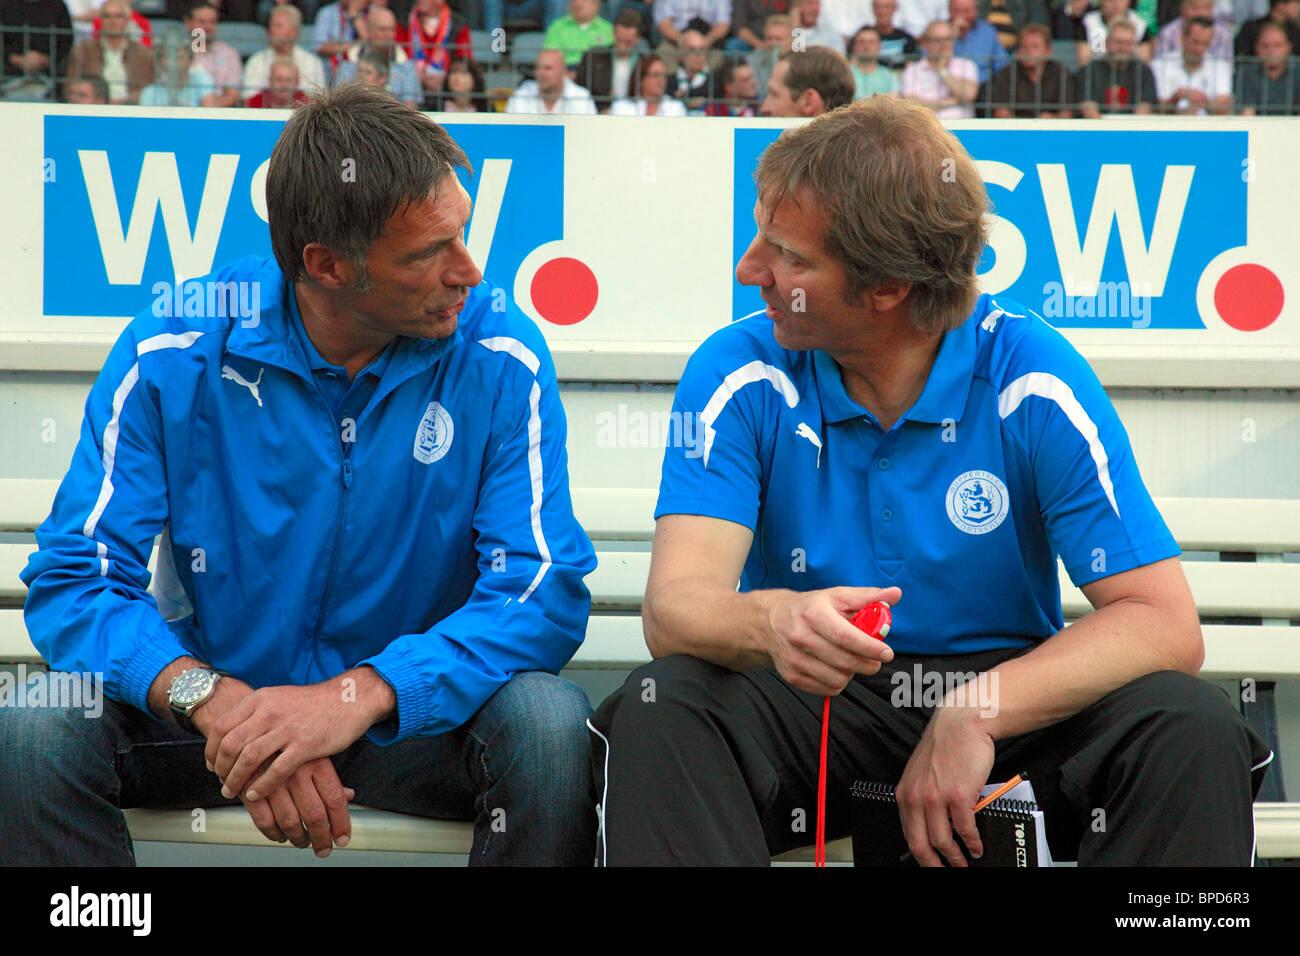 D-Wuppertal, Wupper, Bergisches Land, North Rhine-Westphalia, sports, football, Regionalliga West, 2010/2011, Wuppertaler - Stock Image